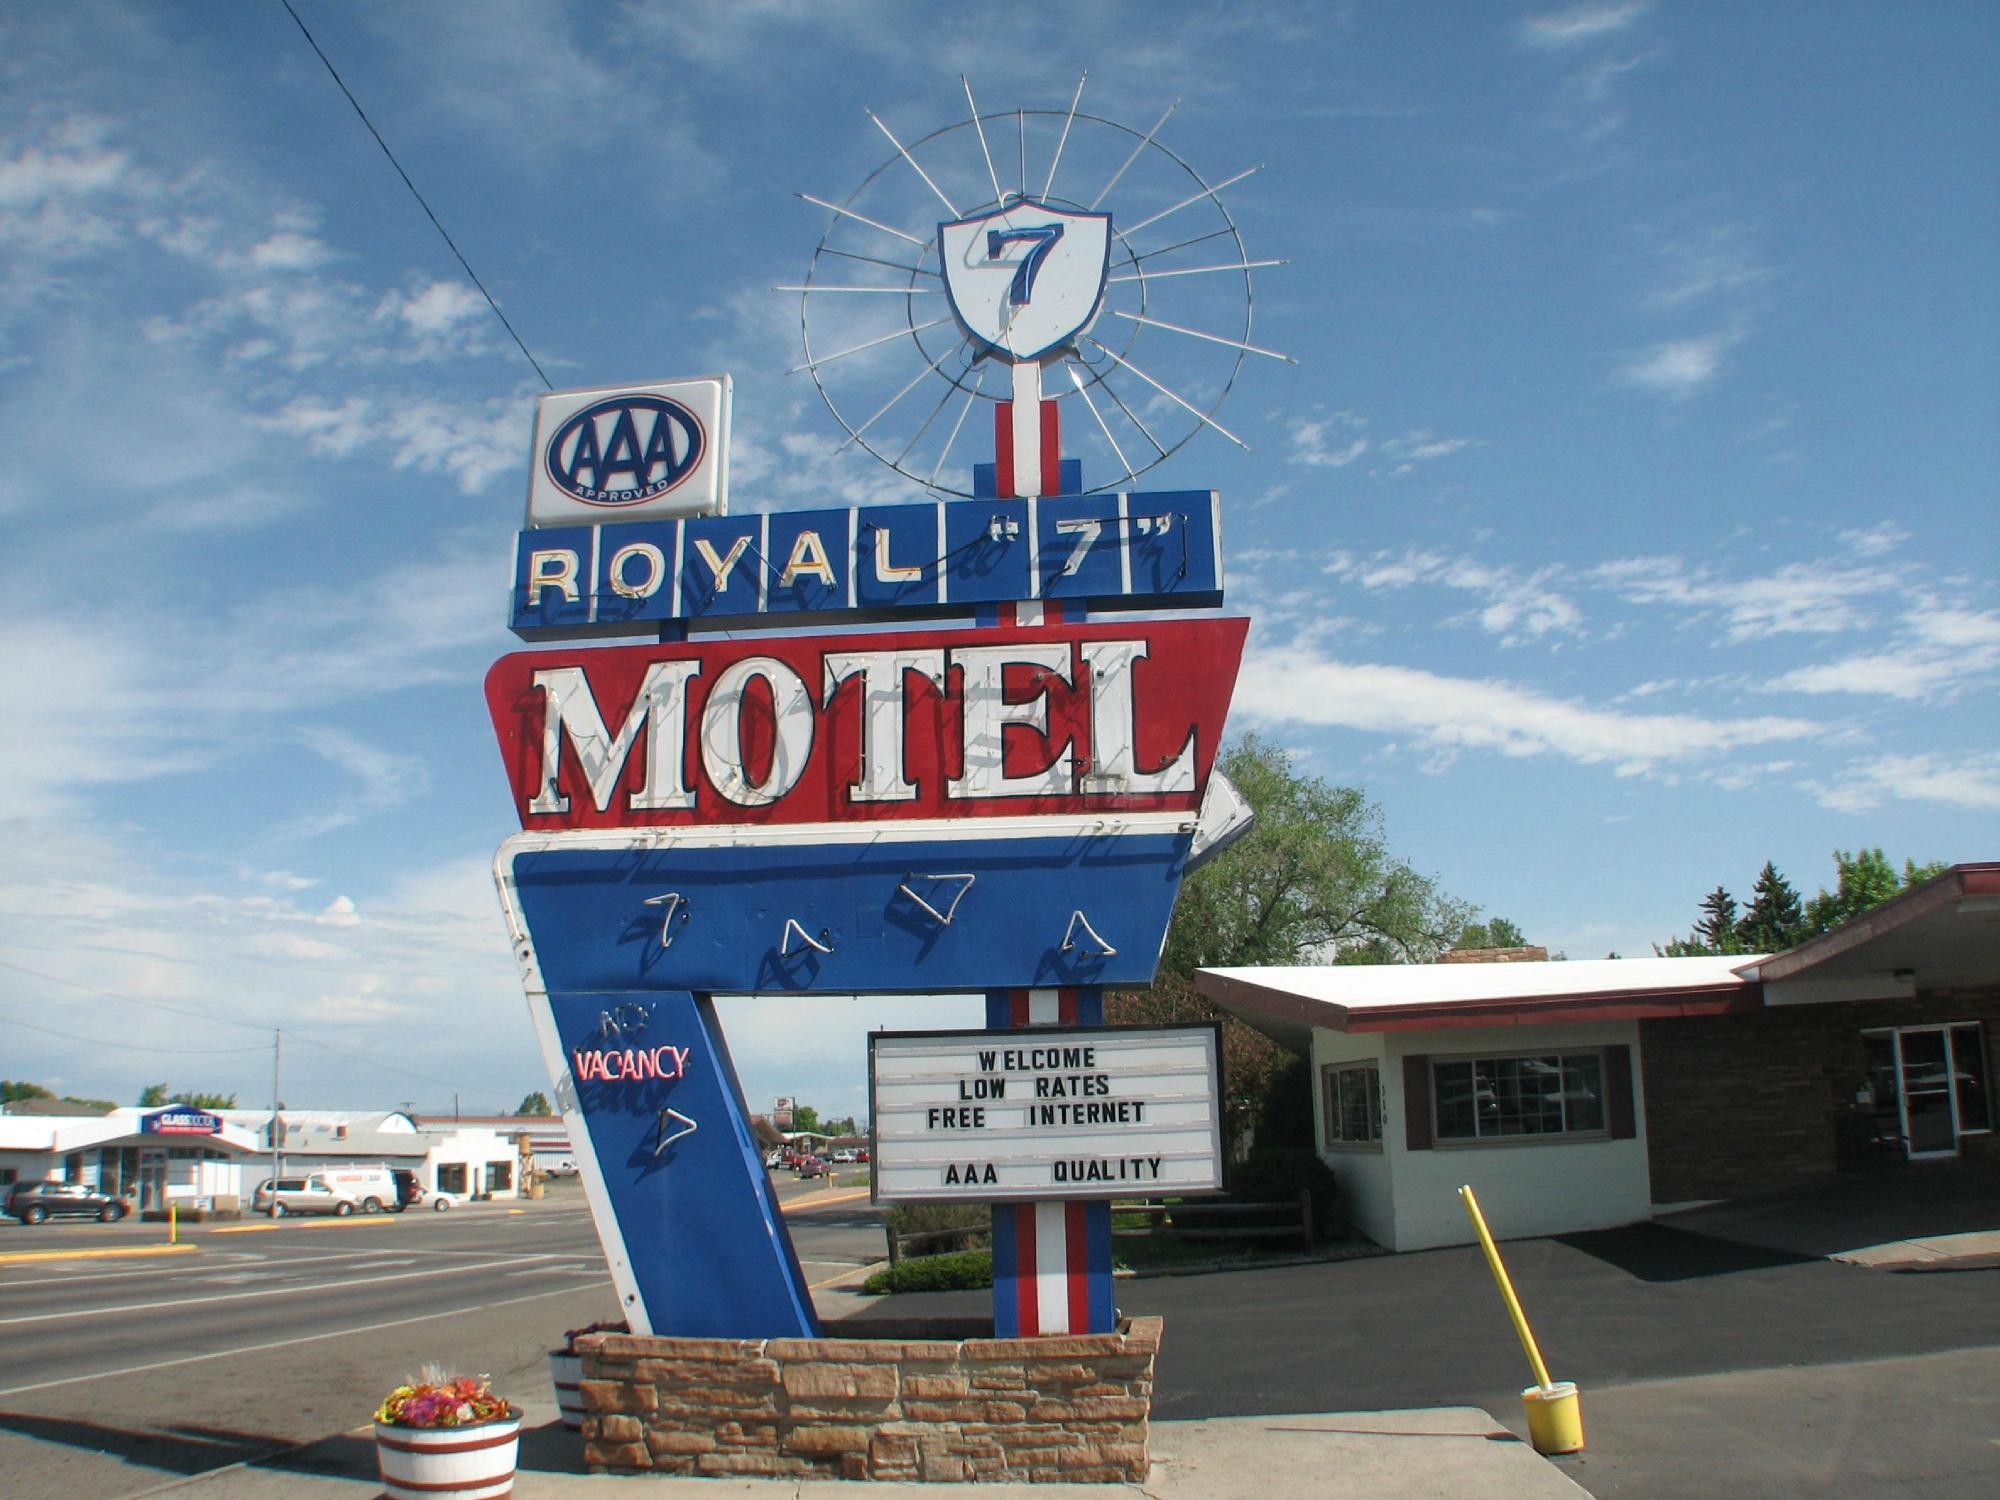 Royal 7 Budget Inn